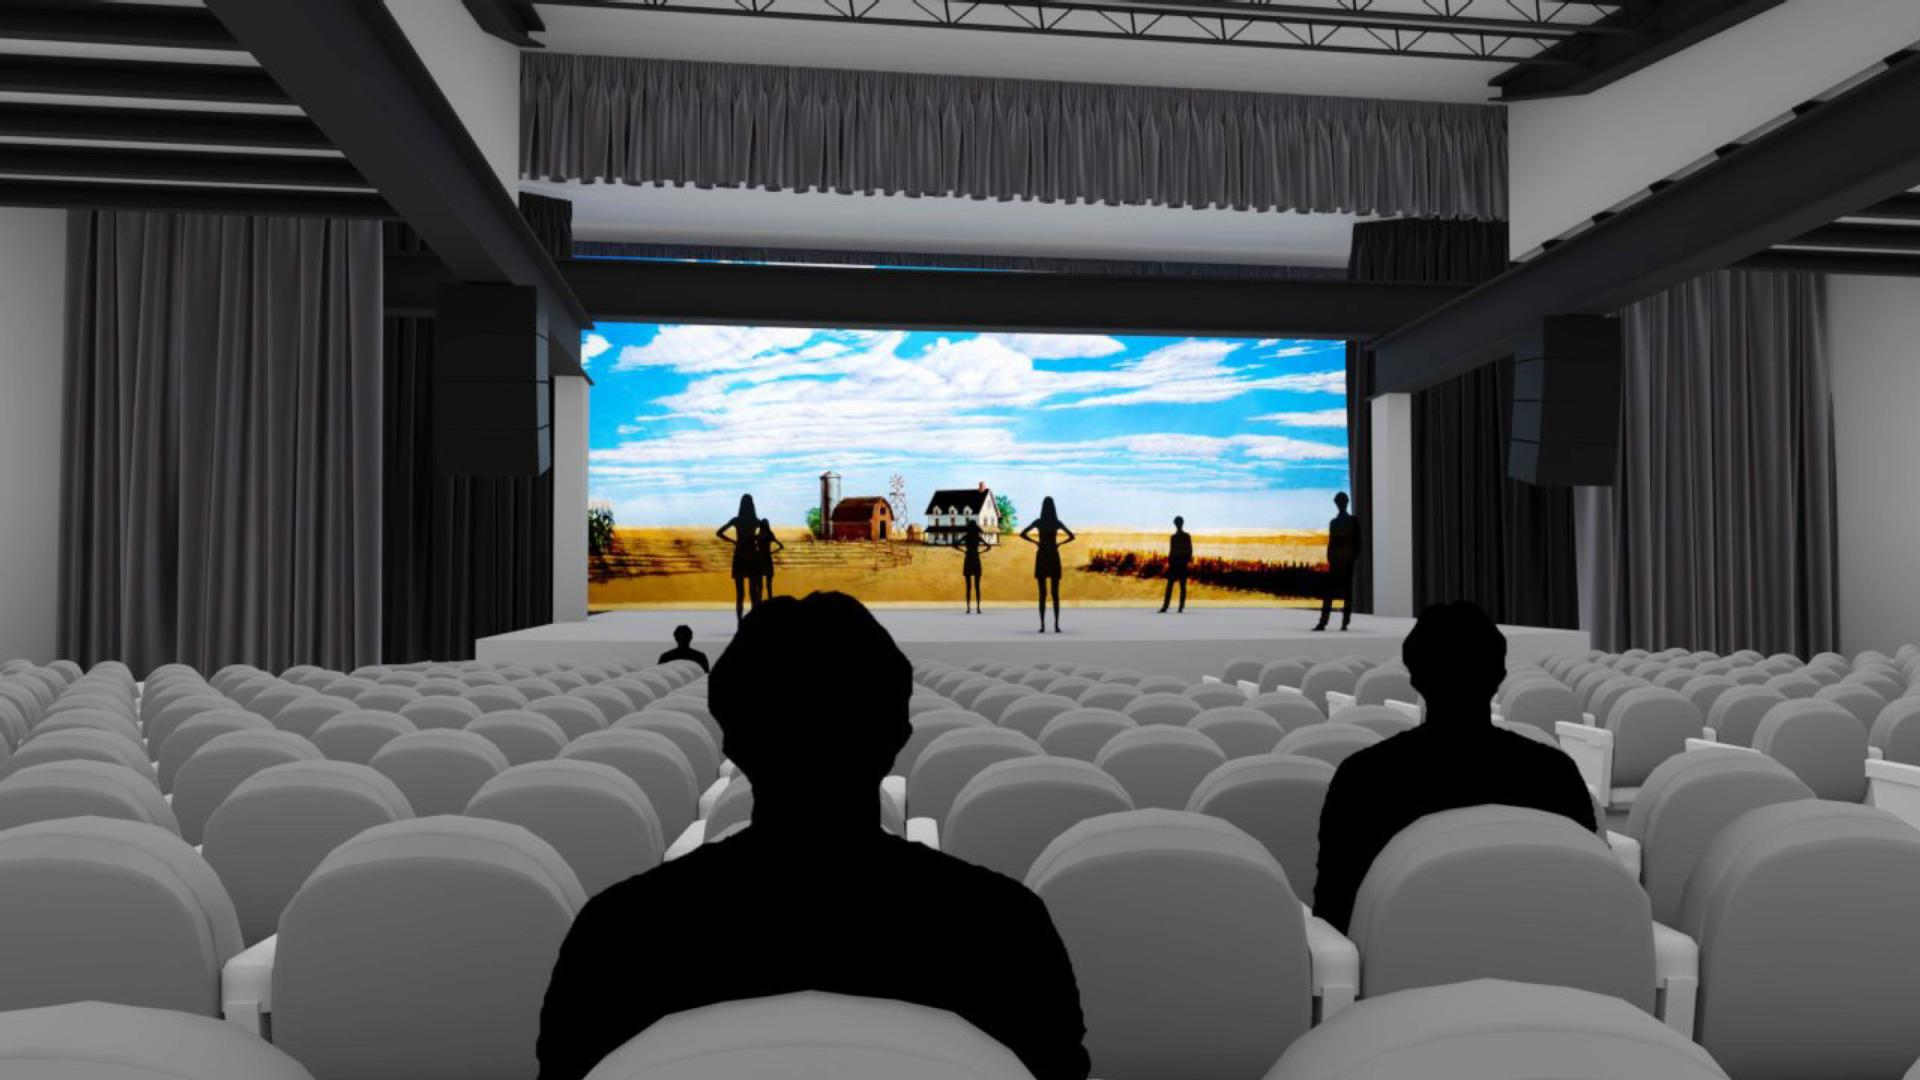 Blue Gate In Shipshewana To Add $3M Theater